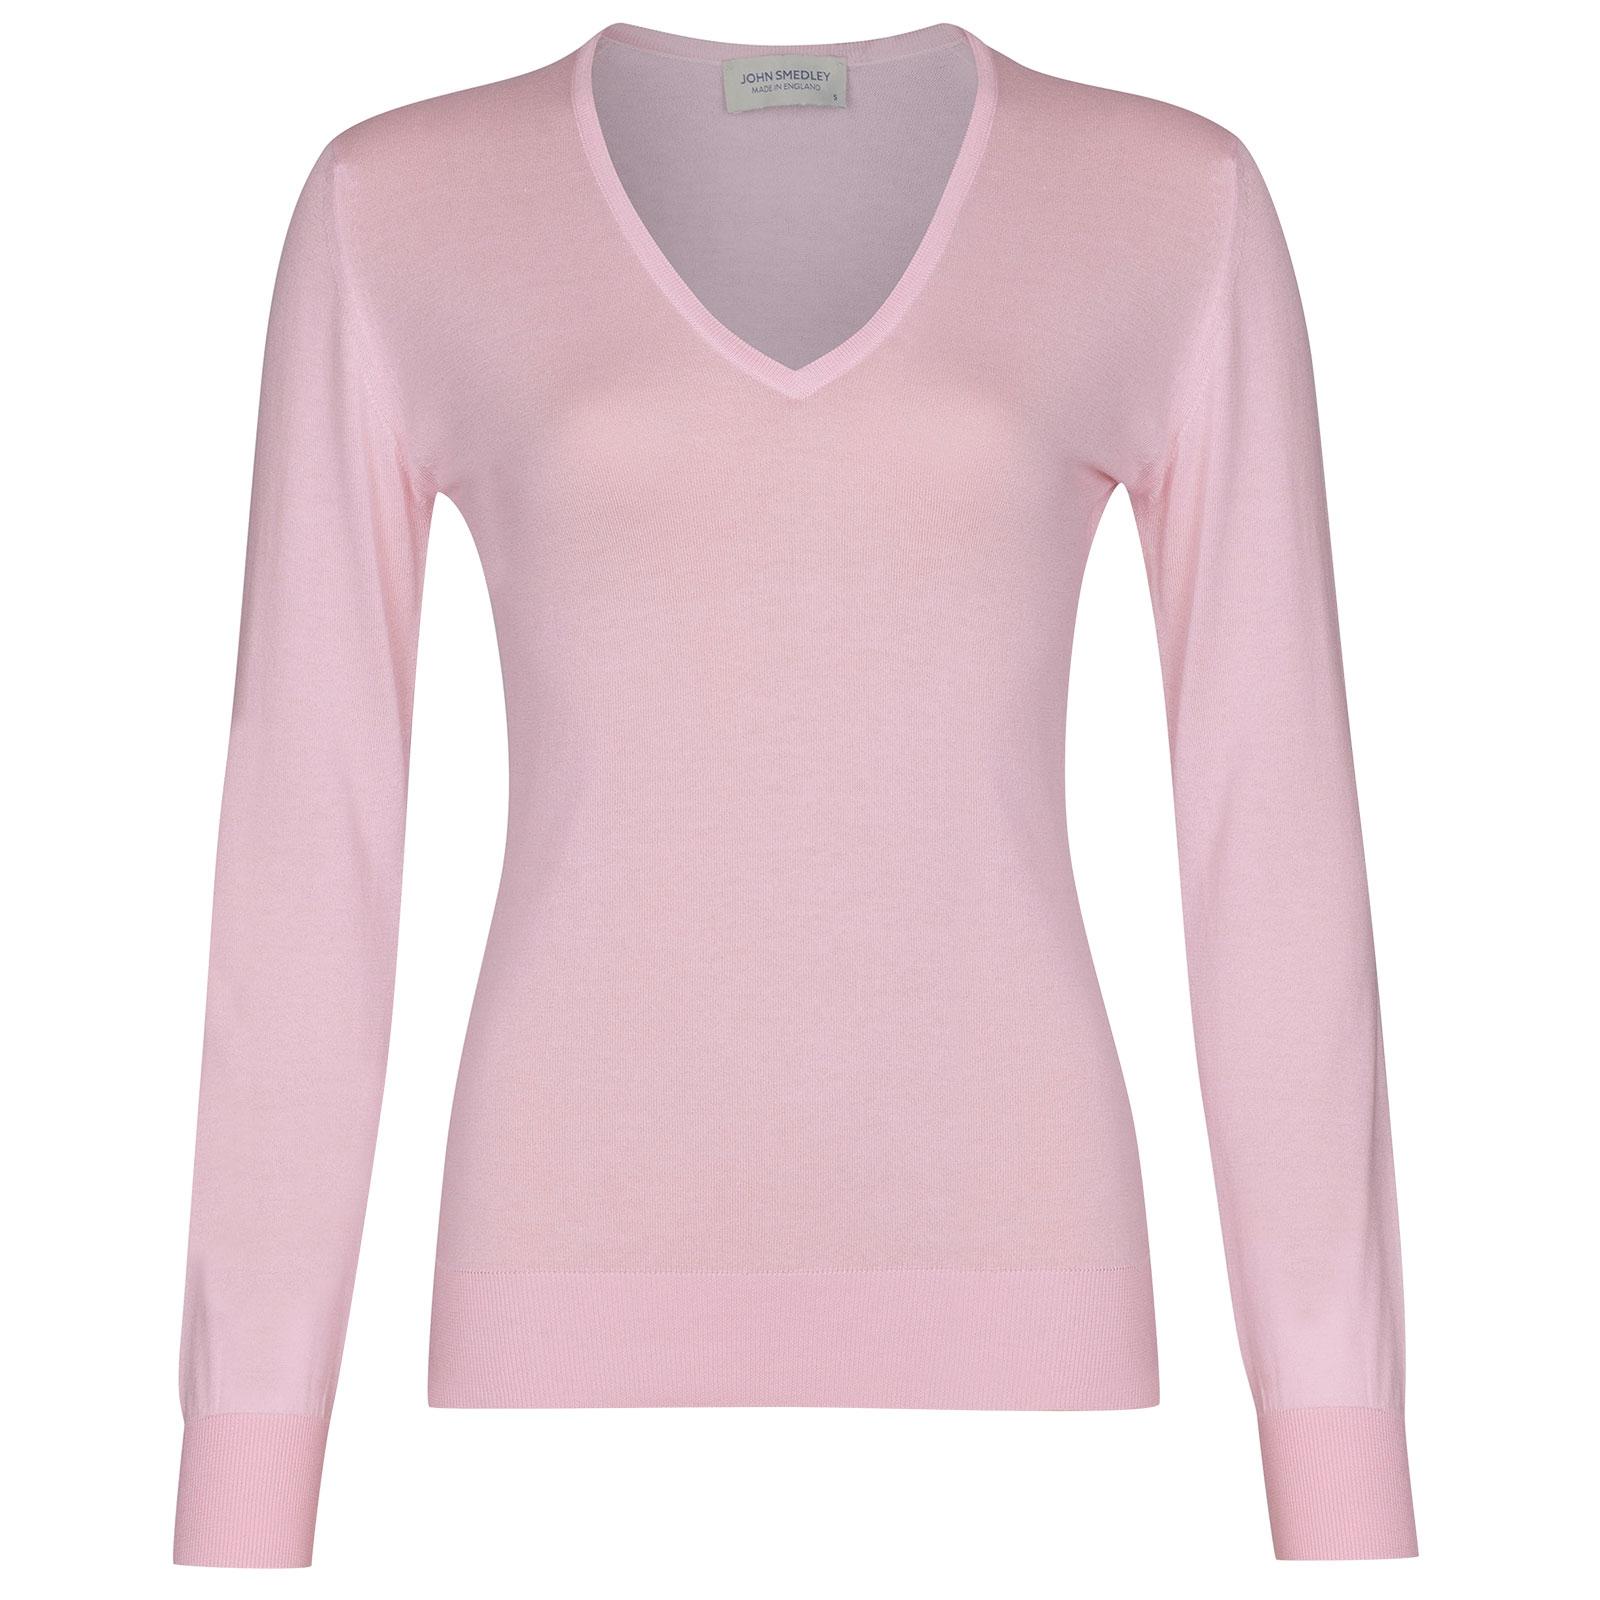 John Smedley Putney in Pink Blossom Sweater-MED